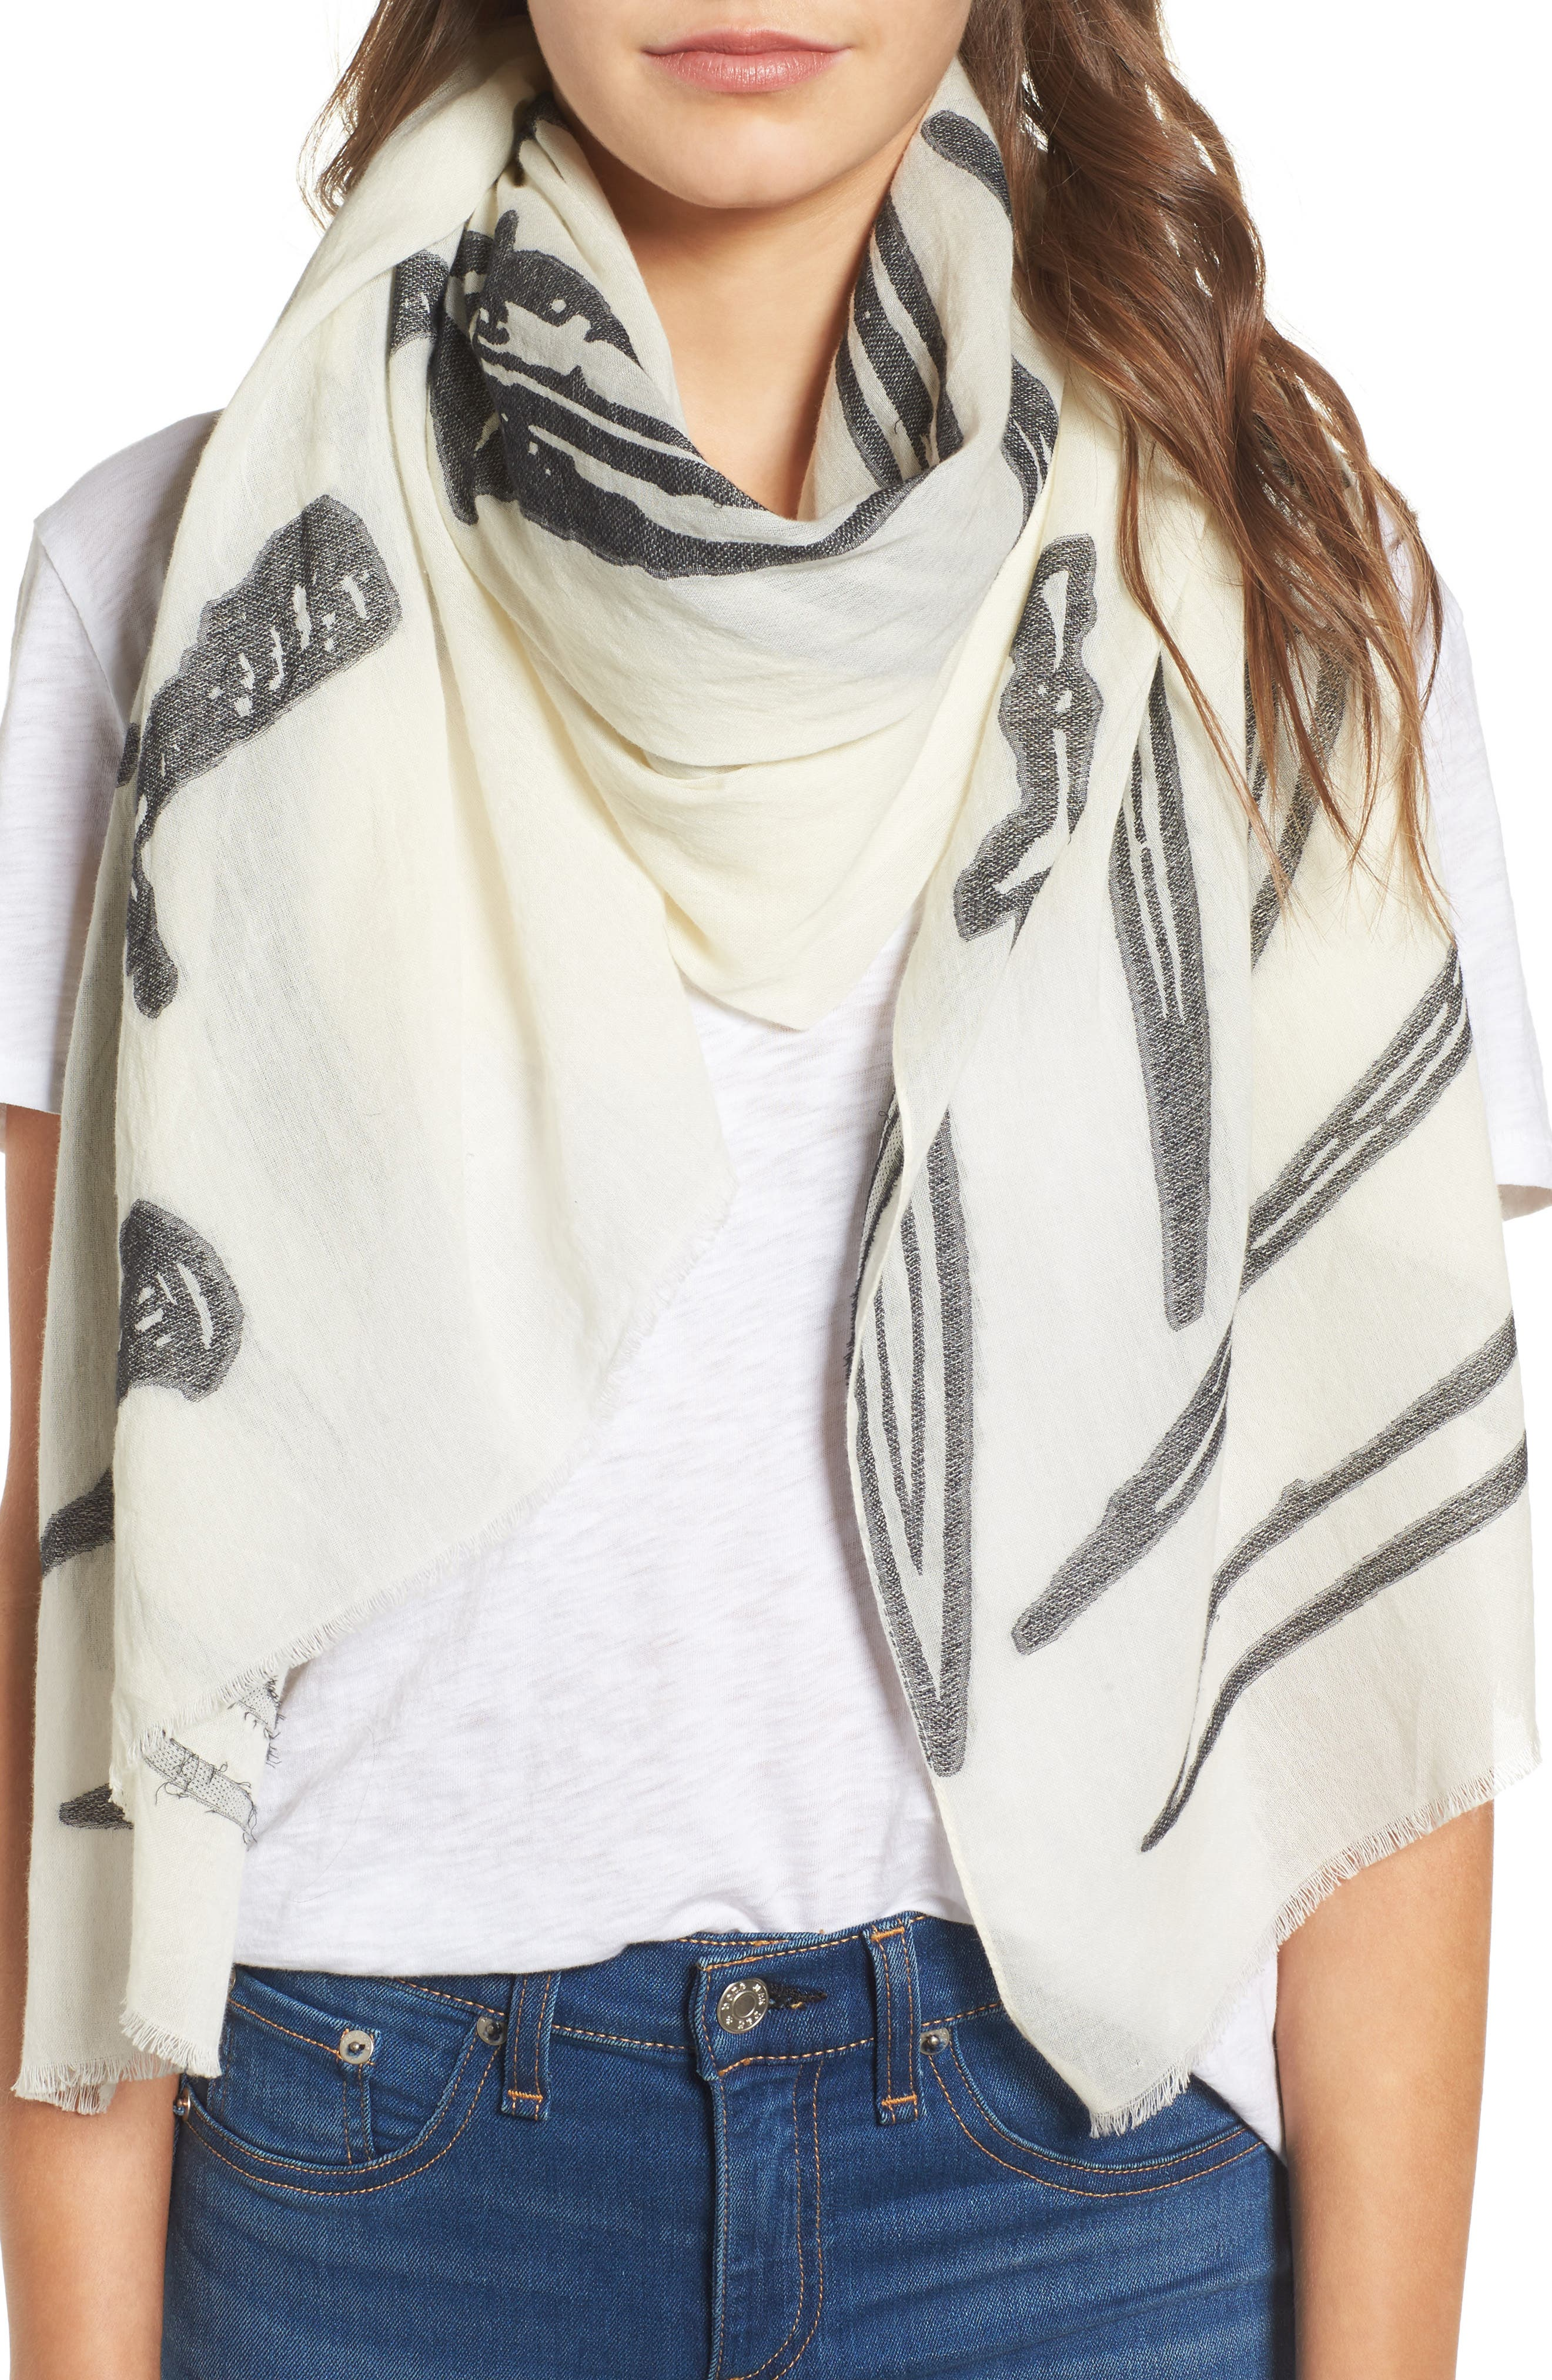 Alternate Image 1 Selected - rag & bone dagger print scarf